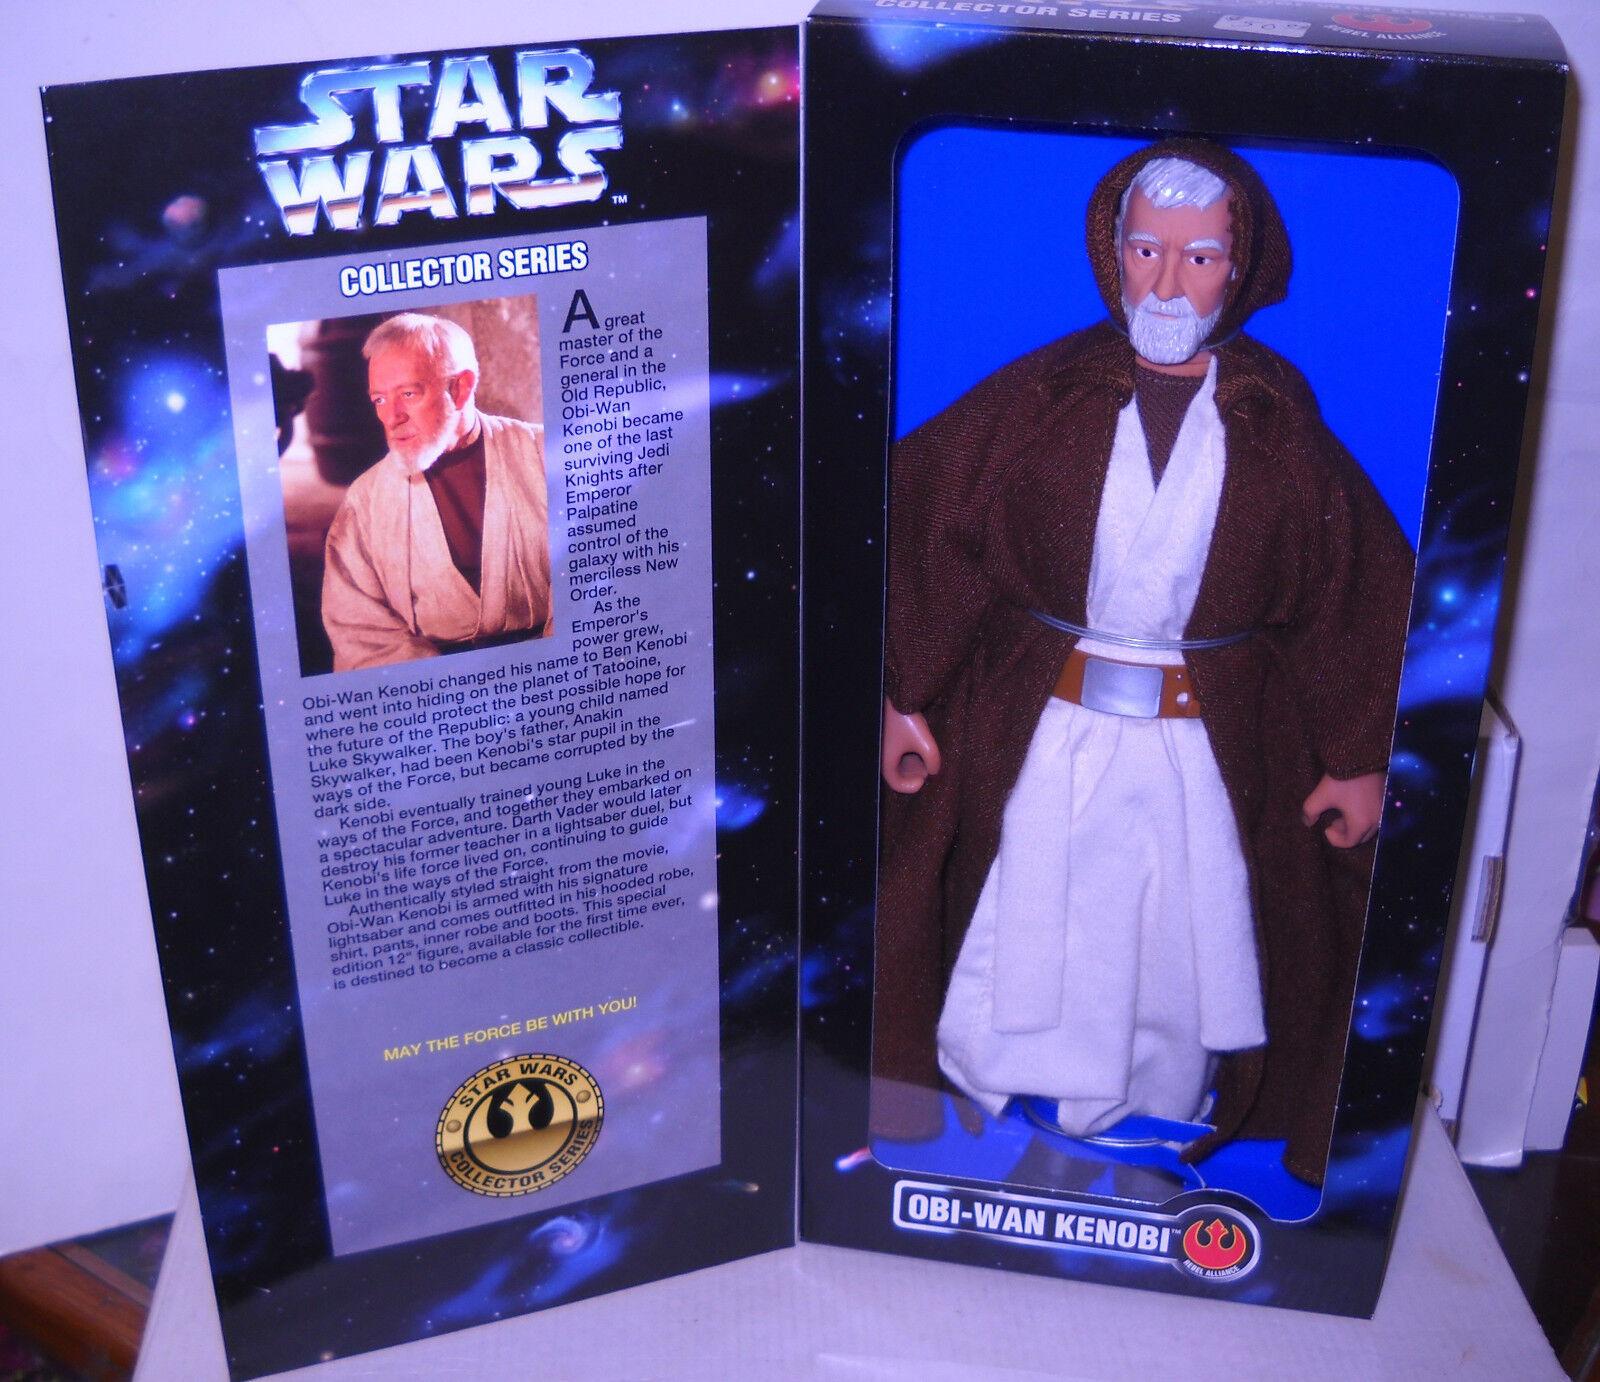 7922 nrfb kenner star - wars - 12  obi - wan kenobi action - figur